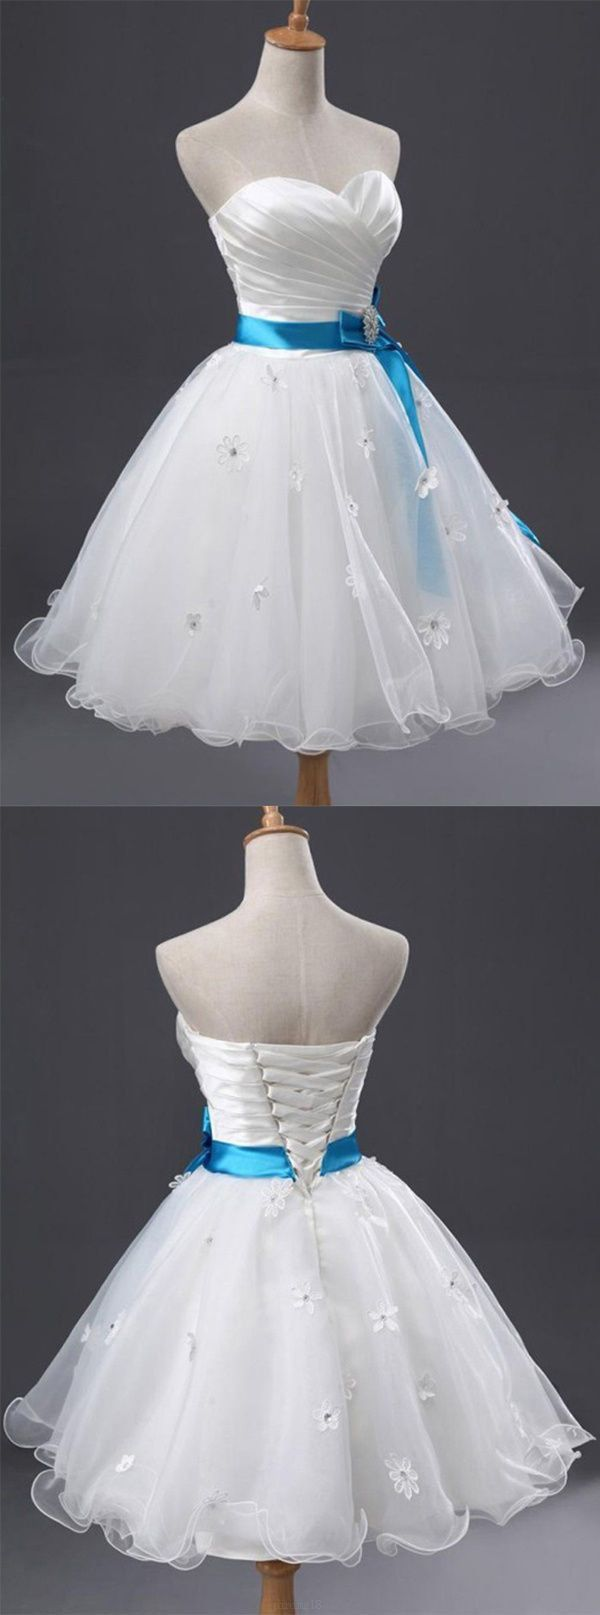 Short prom dresses white prom dresses prom dresses short princess